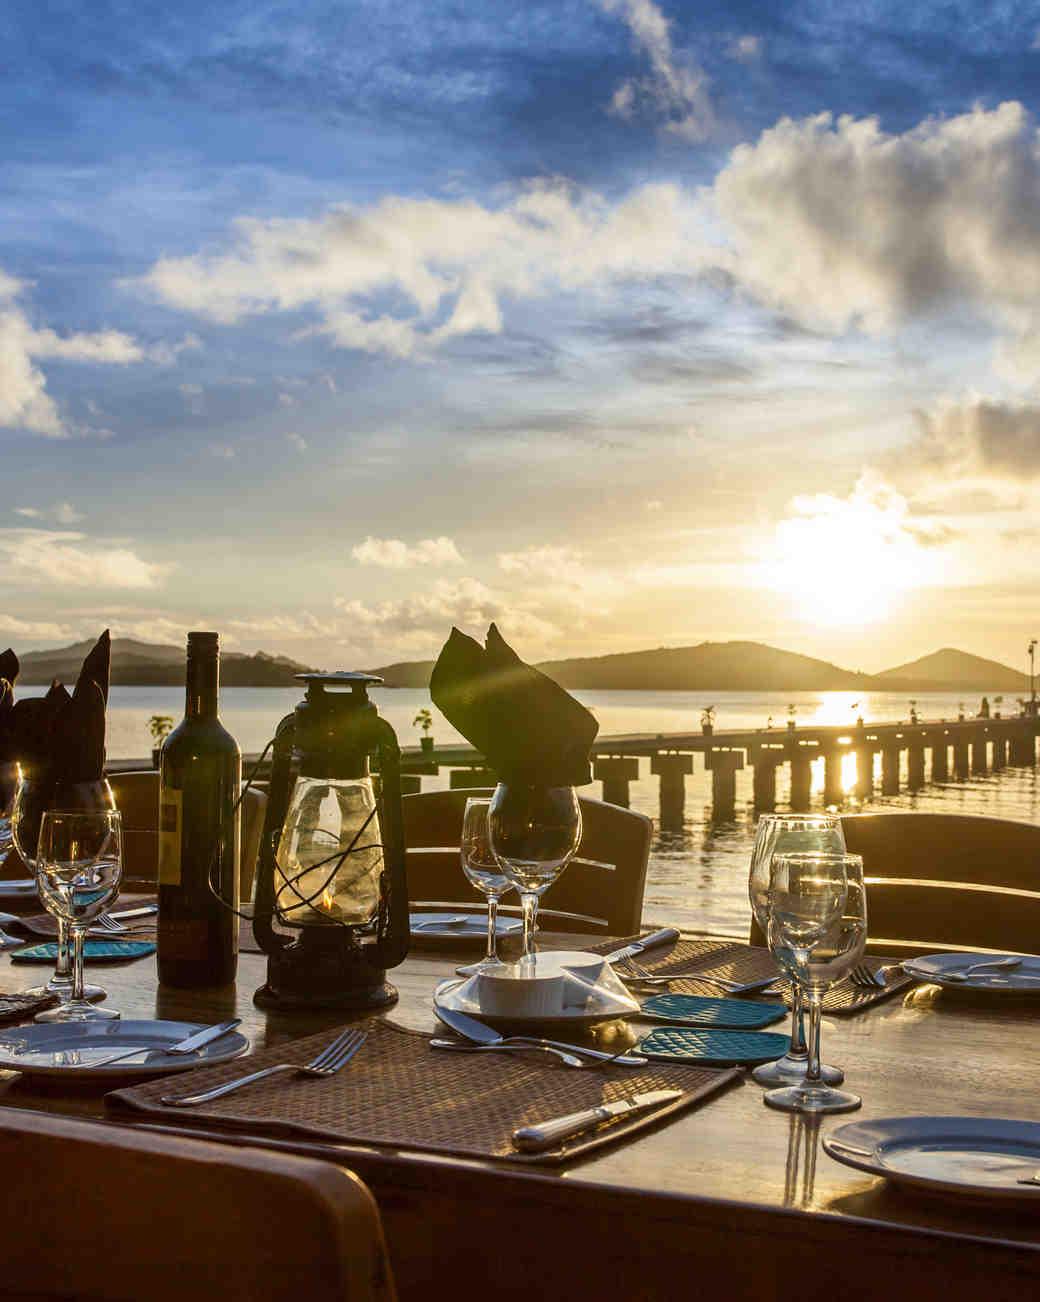 private-islands-turtle-island-dinner-on-beach-1015.jpg